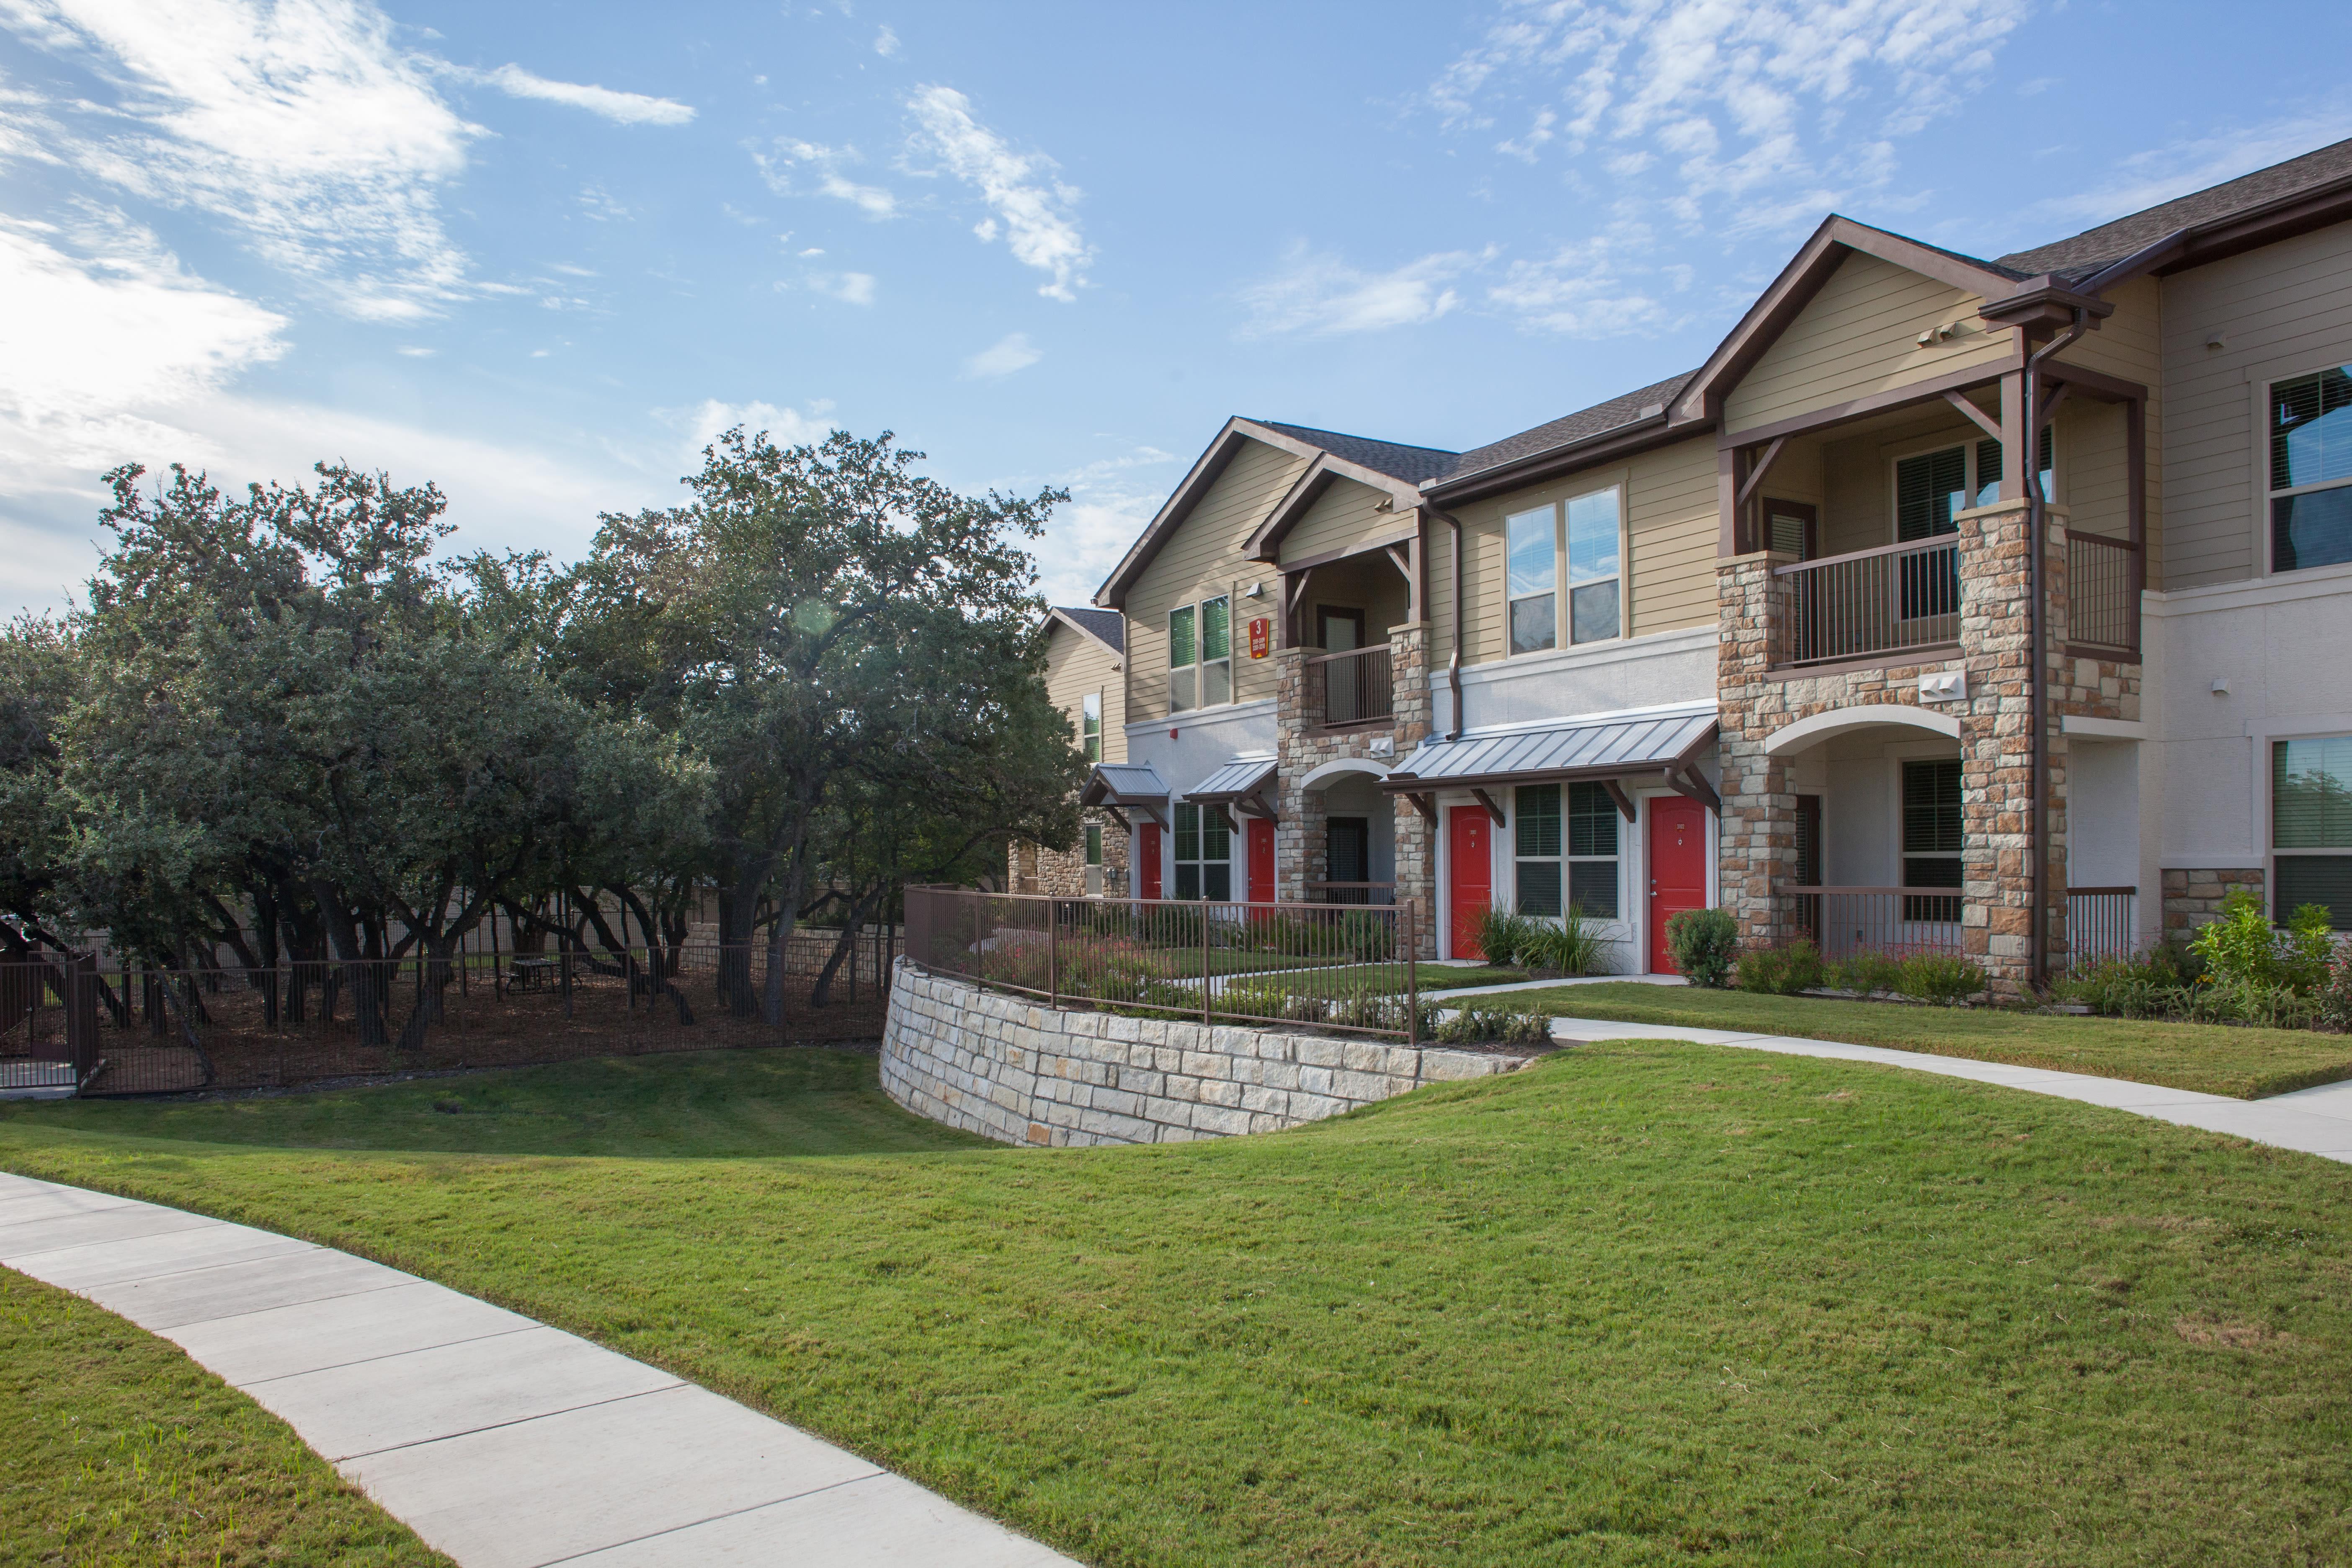 Lawn space and sidewalks outside at Firewheel Apartments in San Antonio